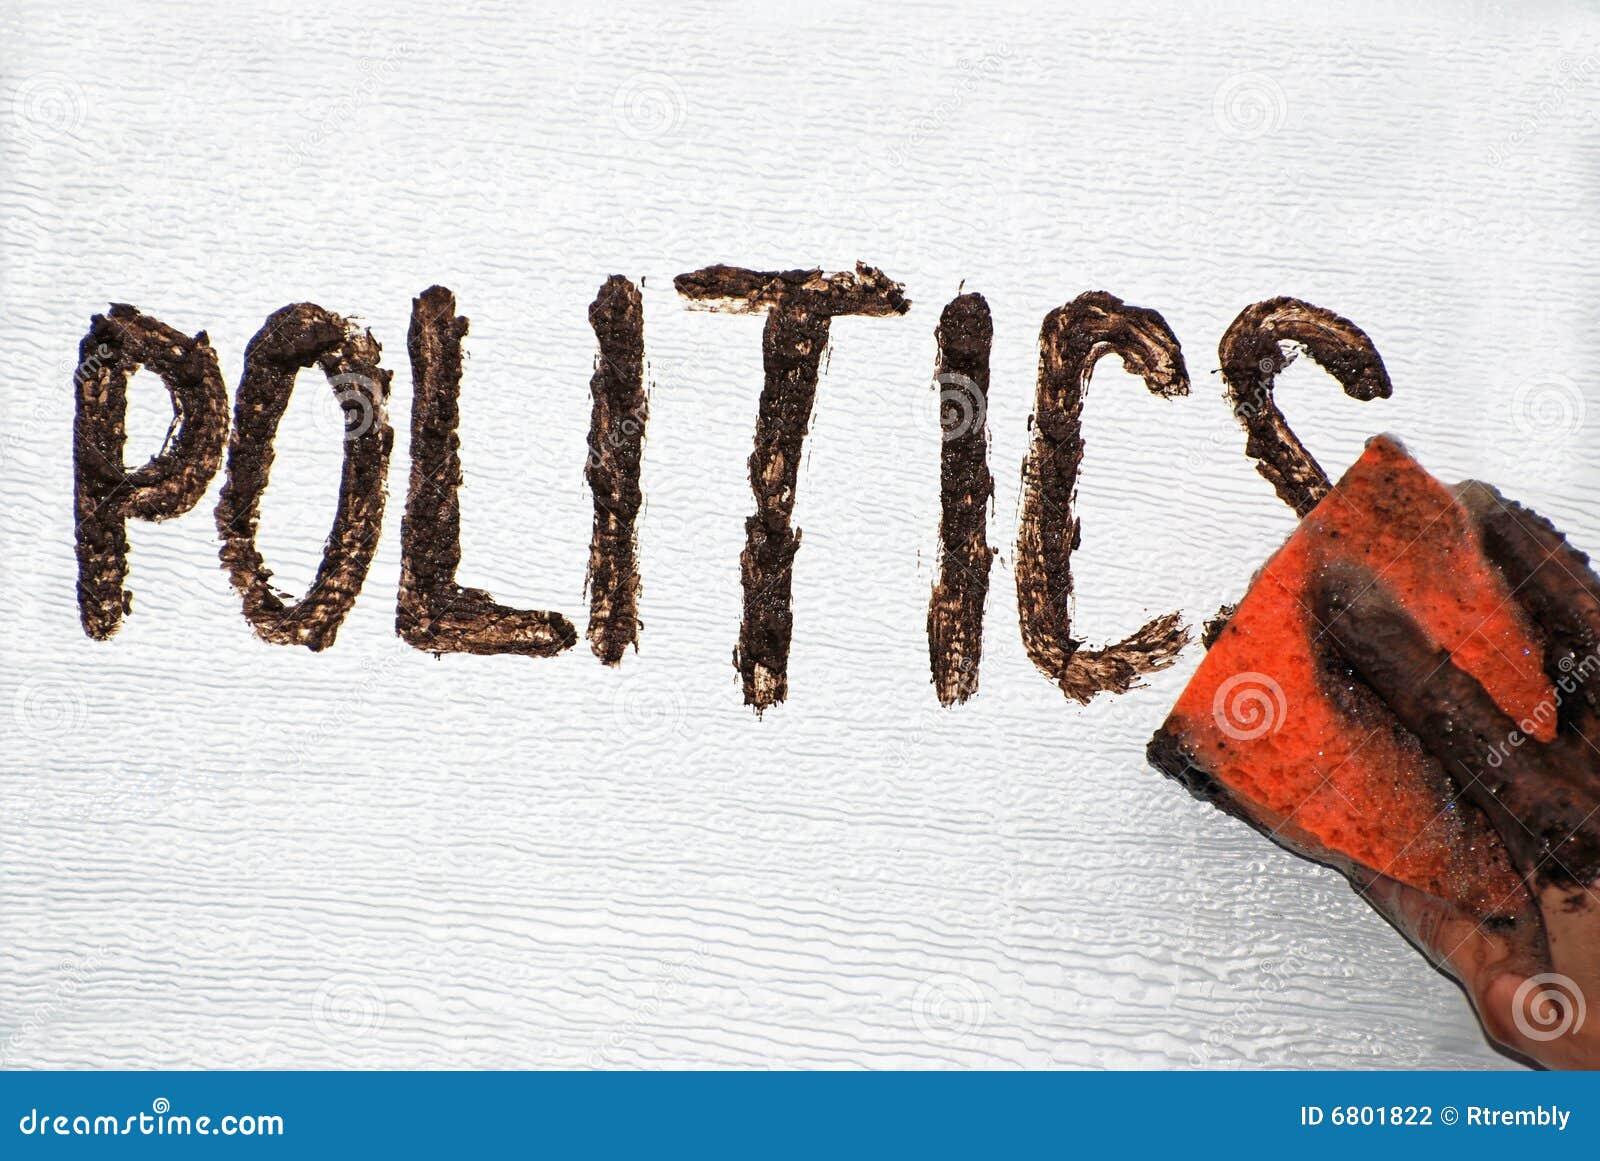 Modderige Politiek